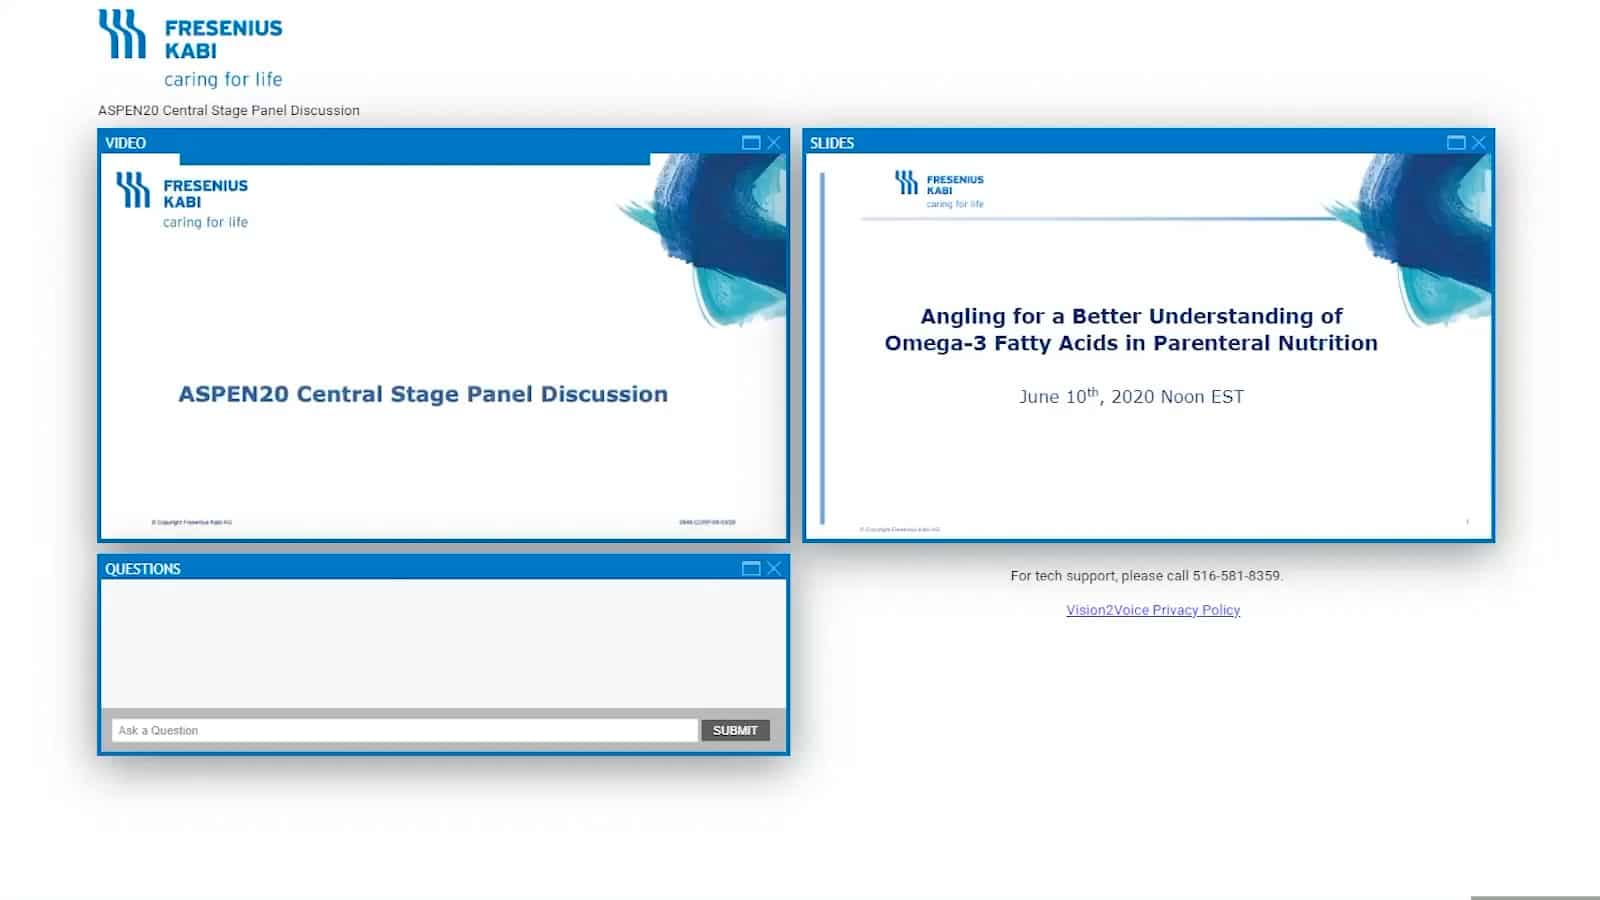 ASPEN20 Central Stage Presentation